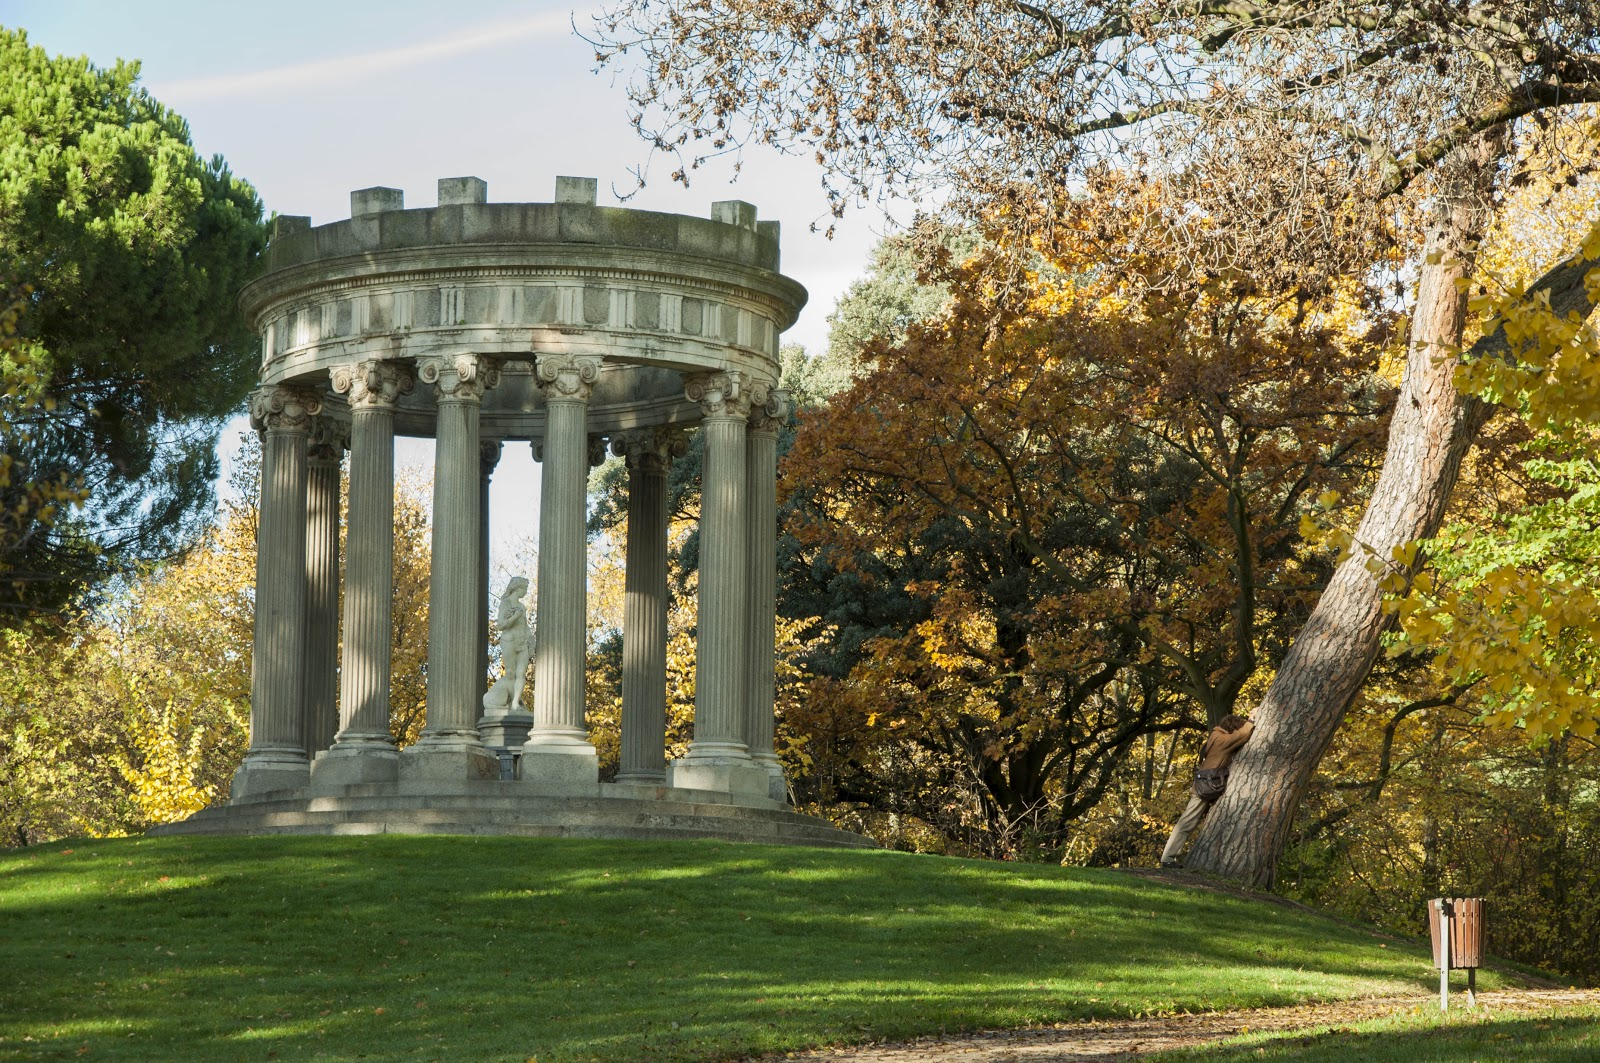 El templo circular en el jard n ingl s the circular for Jardin en ingles